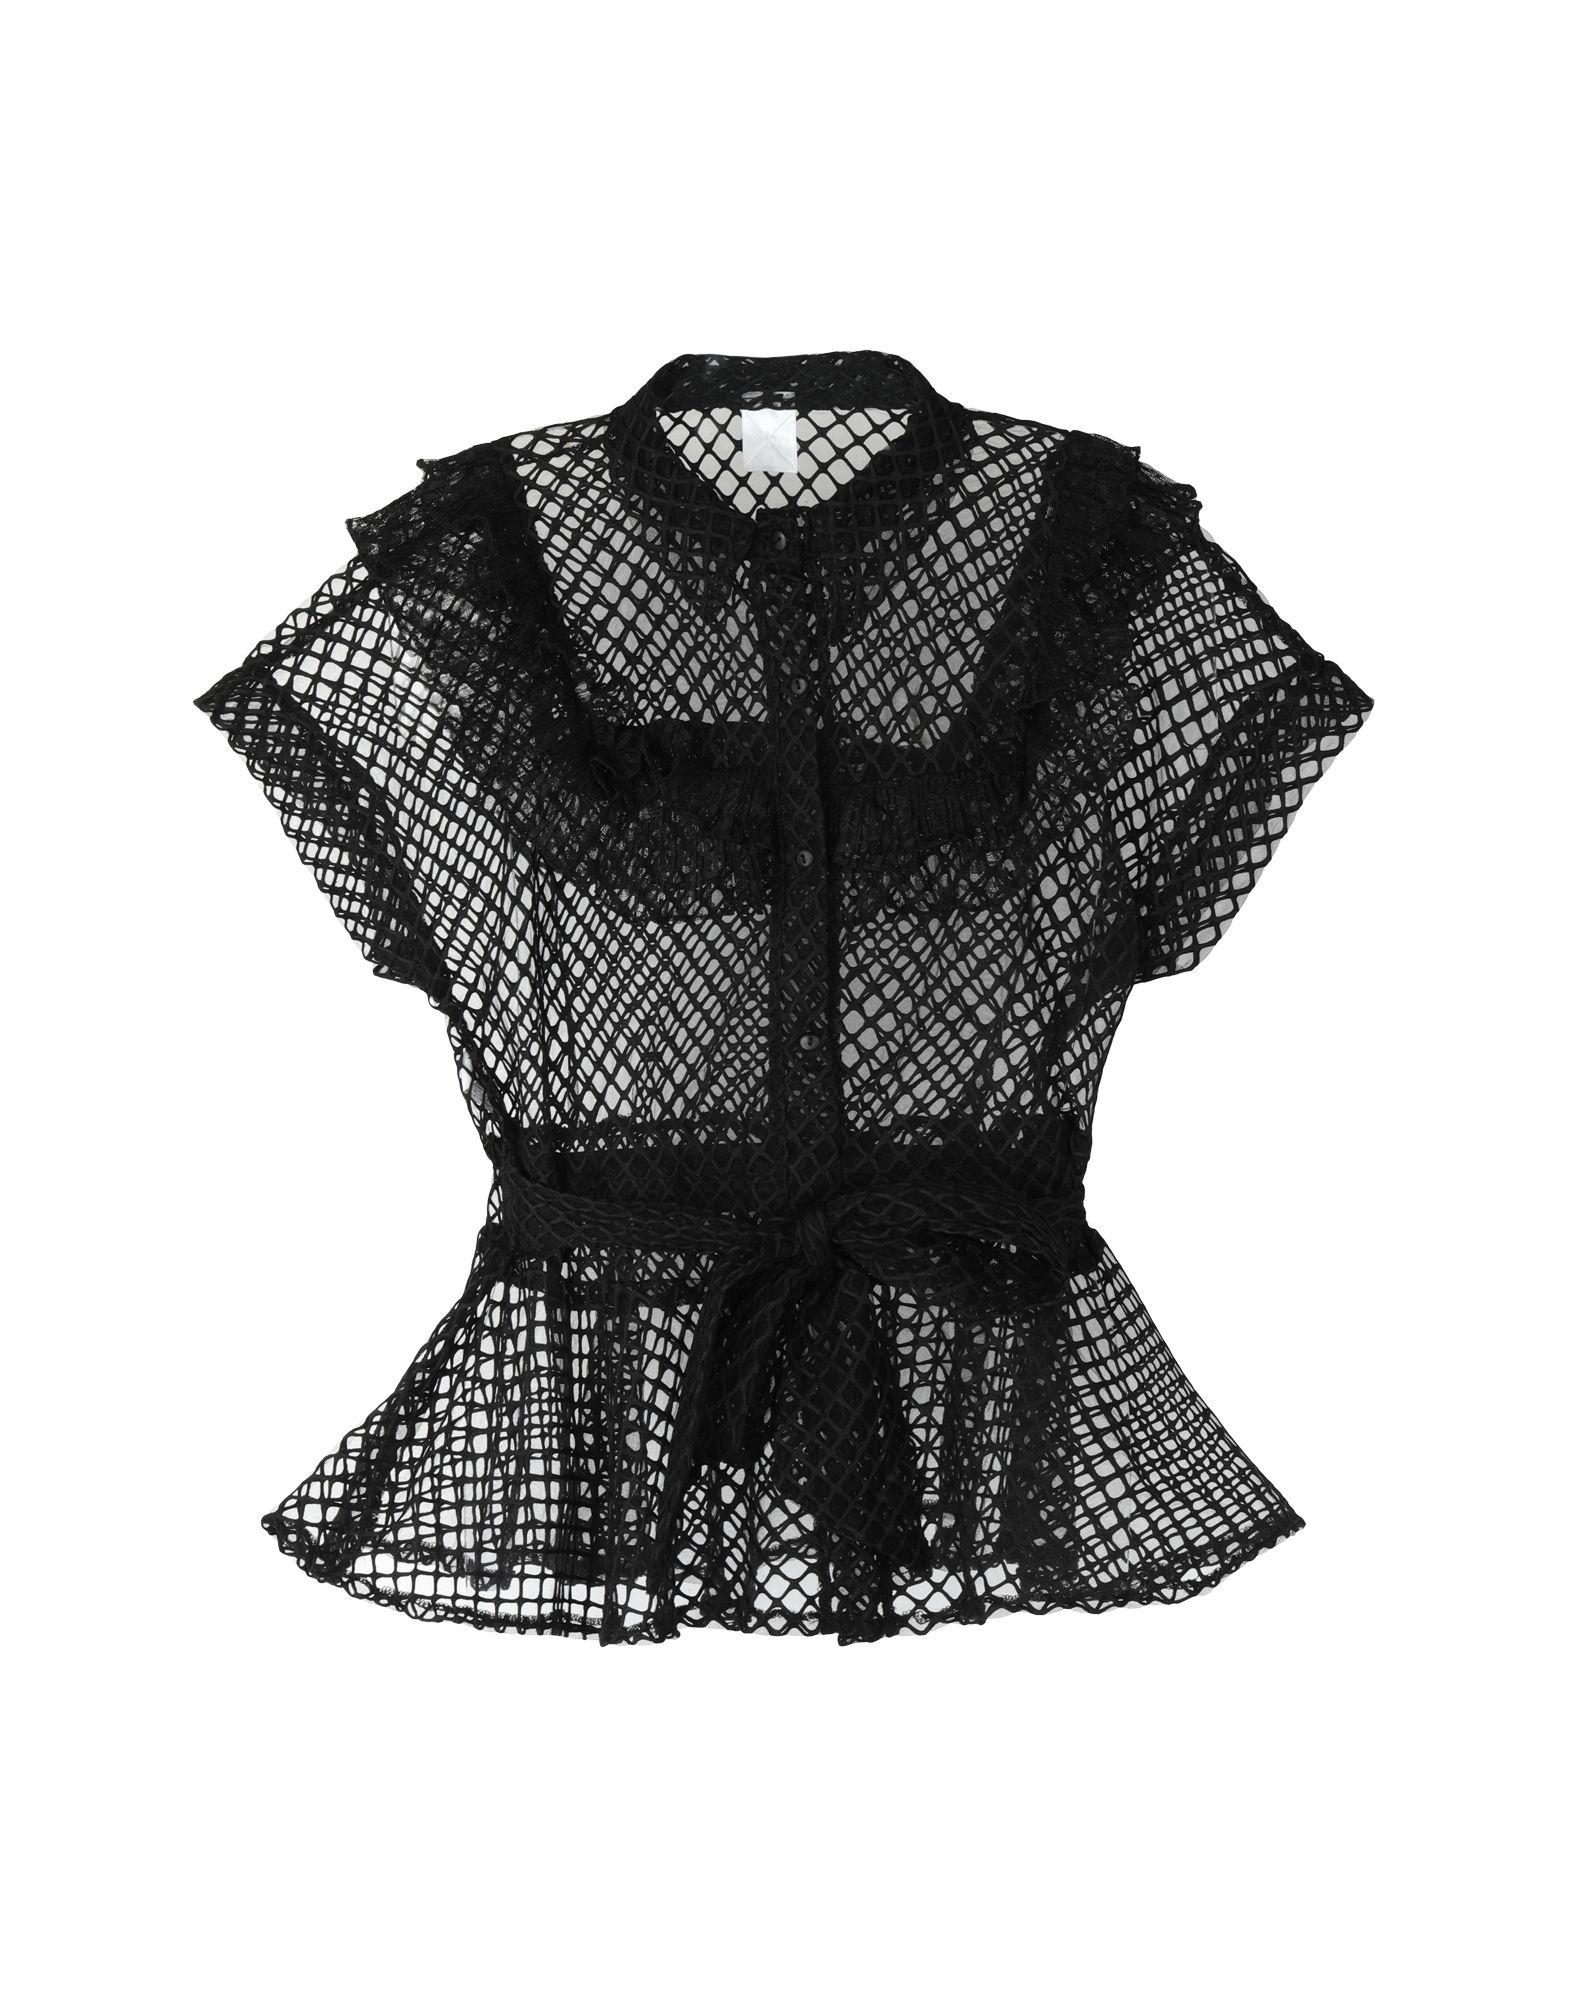 Camicie E bluse In Pizzo Twist Twist Twist X Turn donna - 38834251DQ 7ed